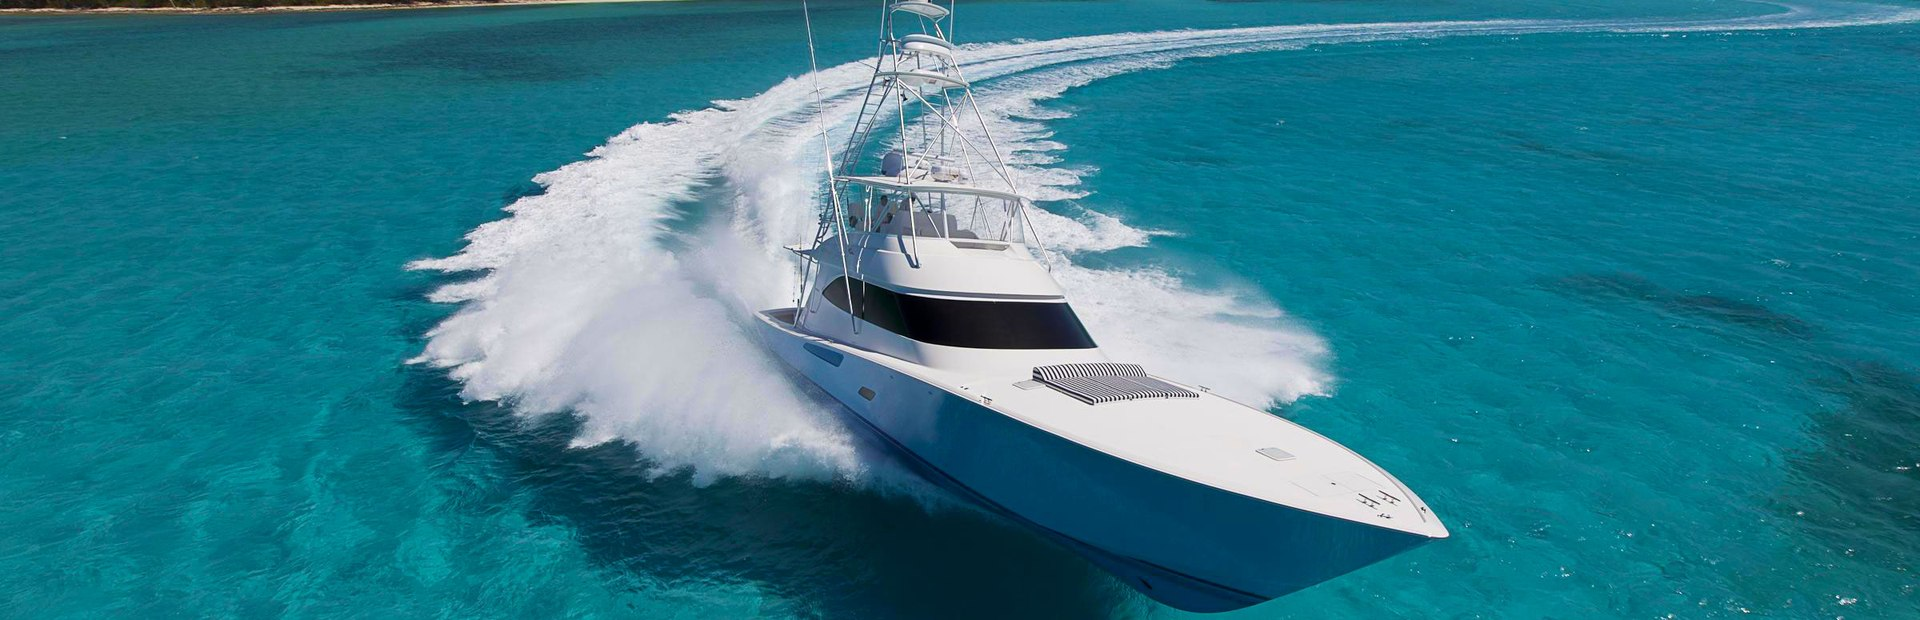 Viking Yachts Profile Photo